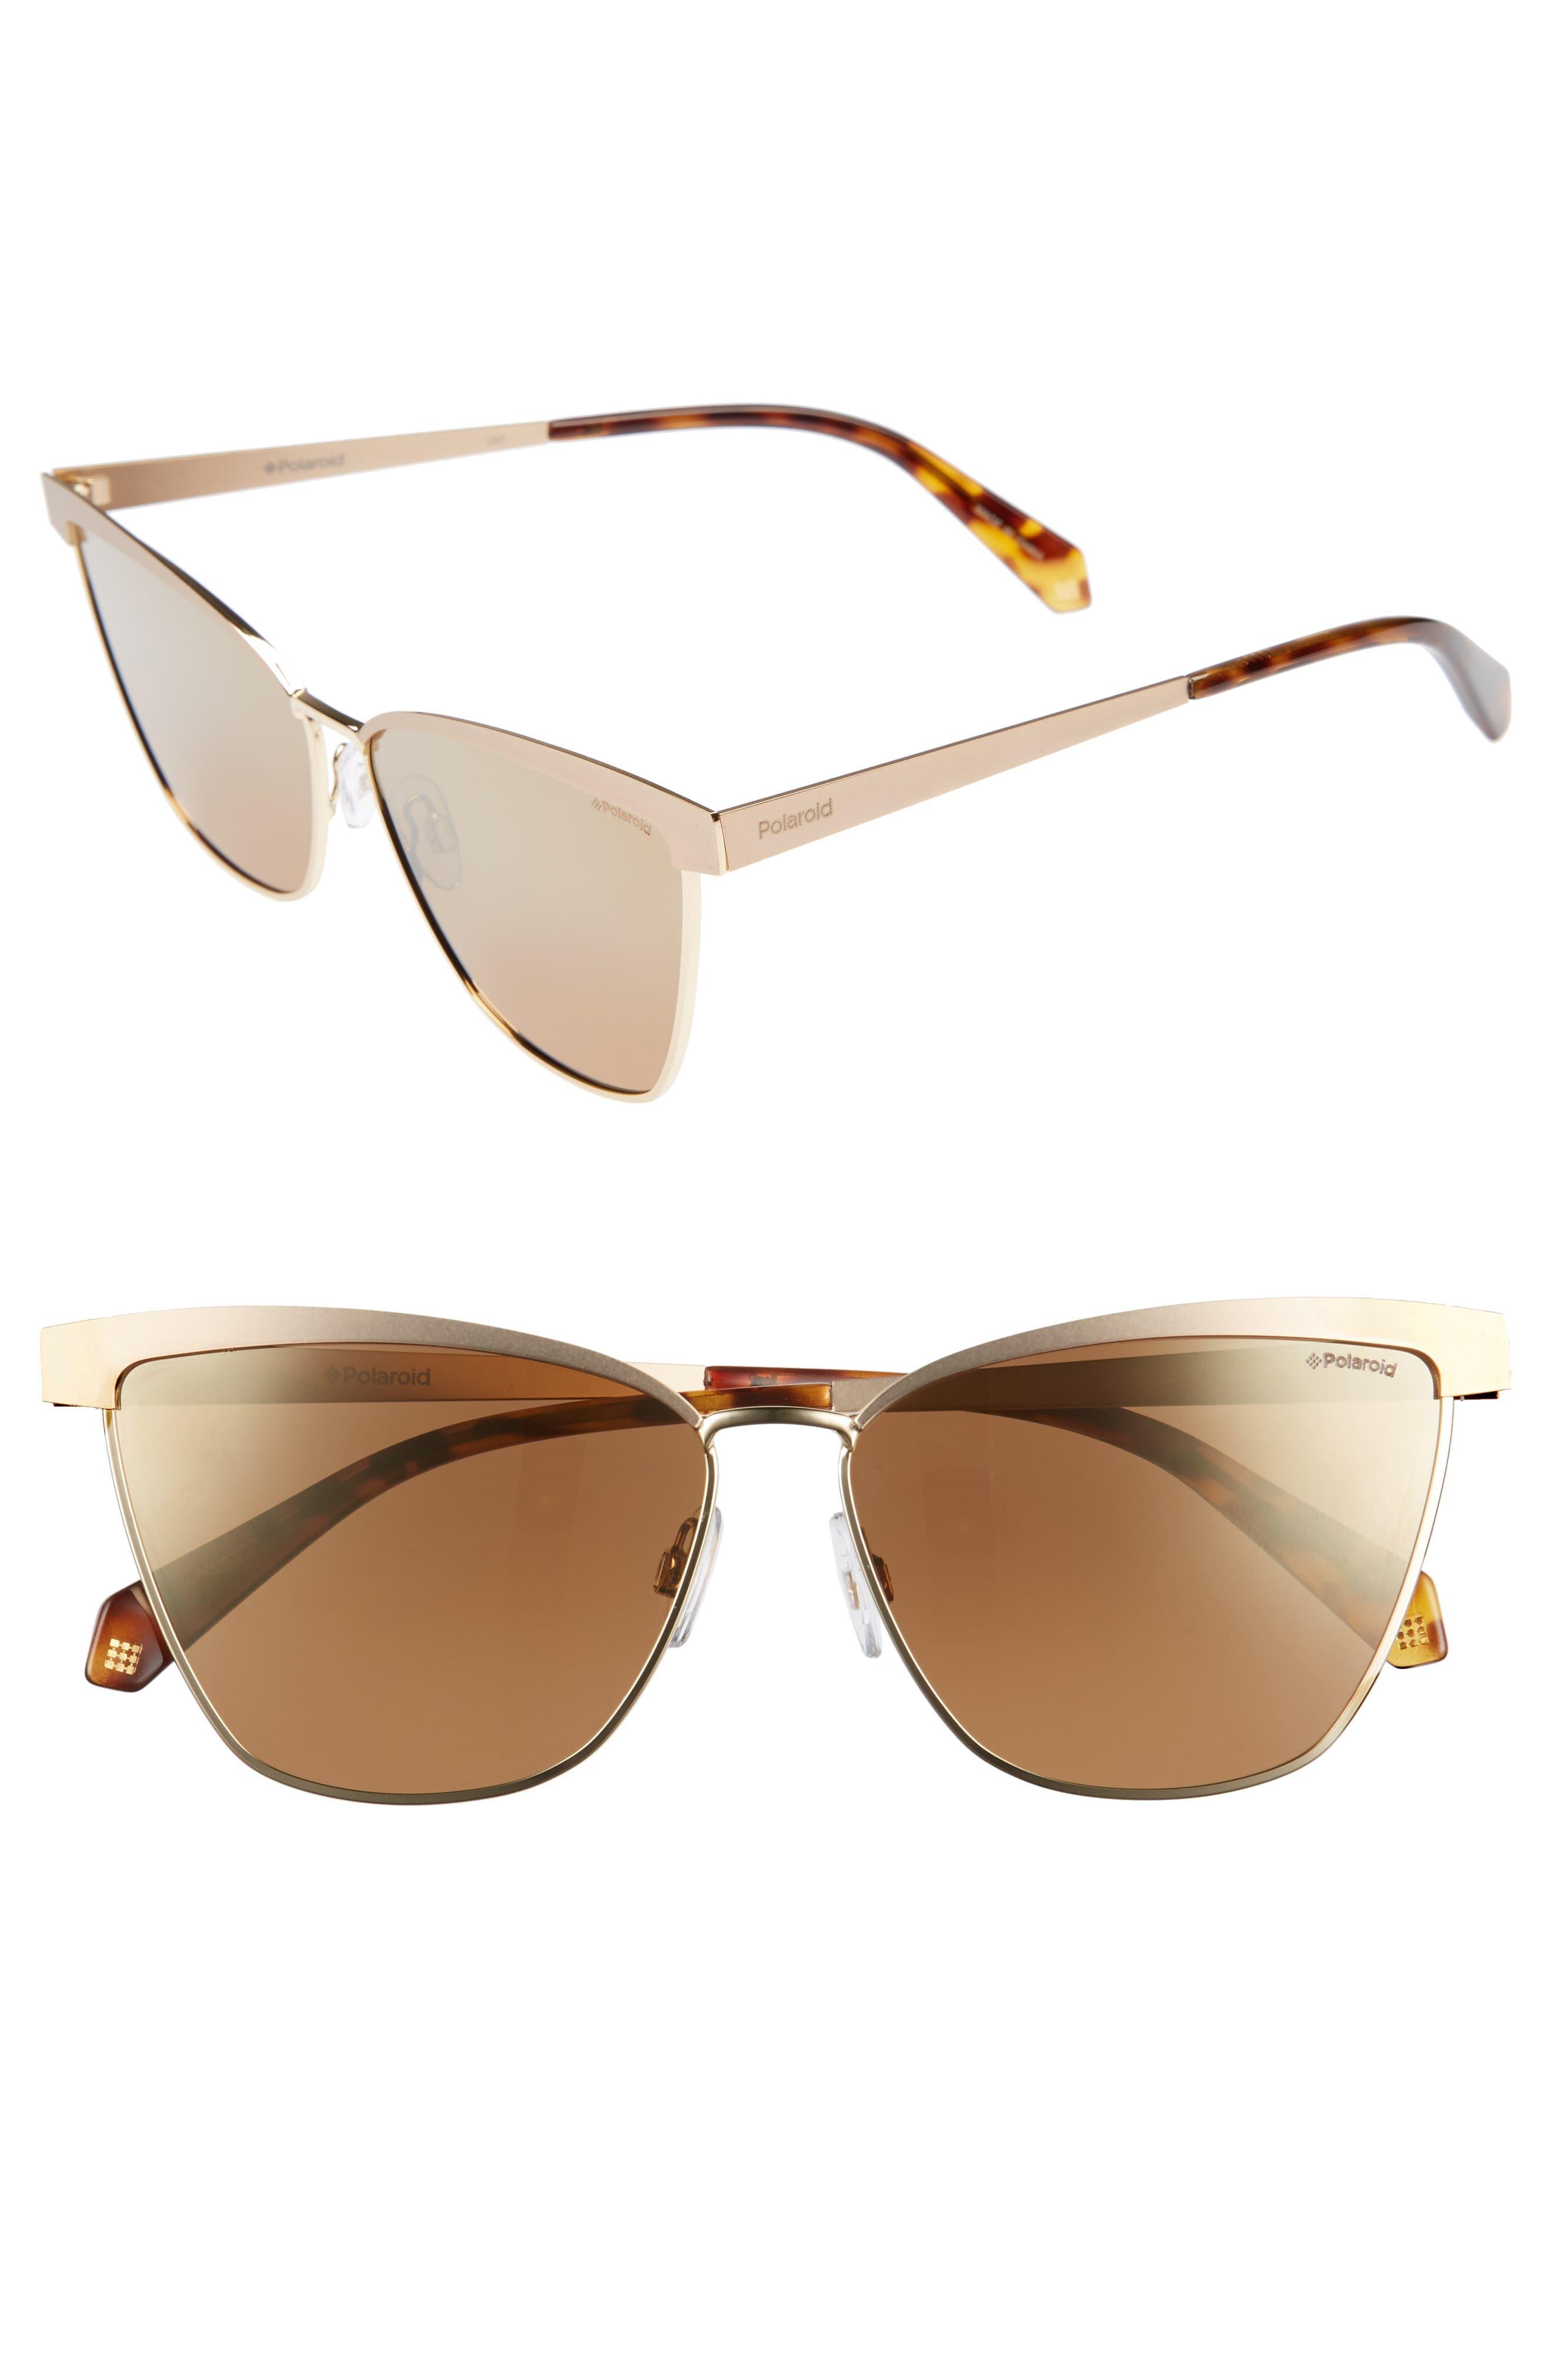 60mm Polarized Cat Eye Sunglasses,                             Main thumbnail 2, color,